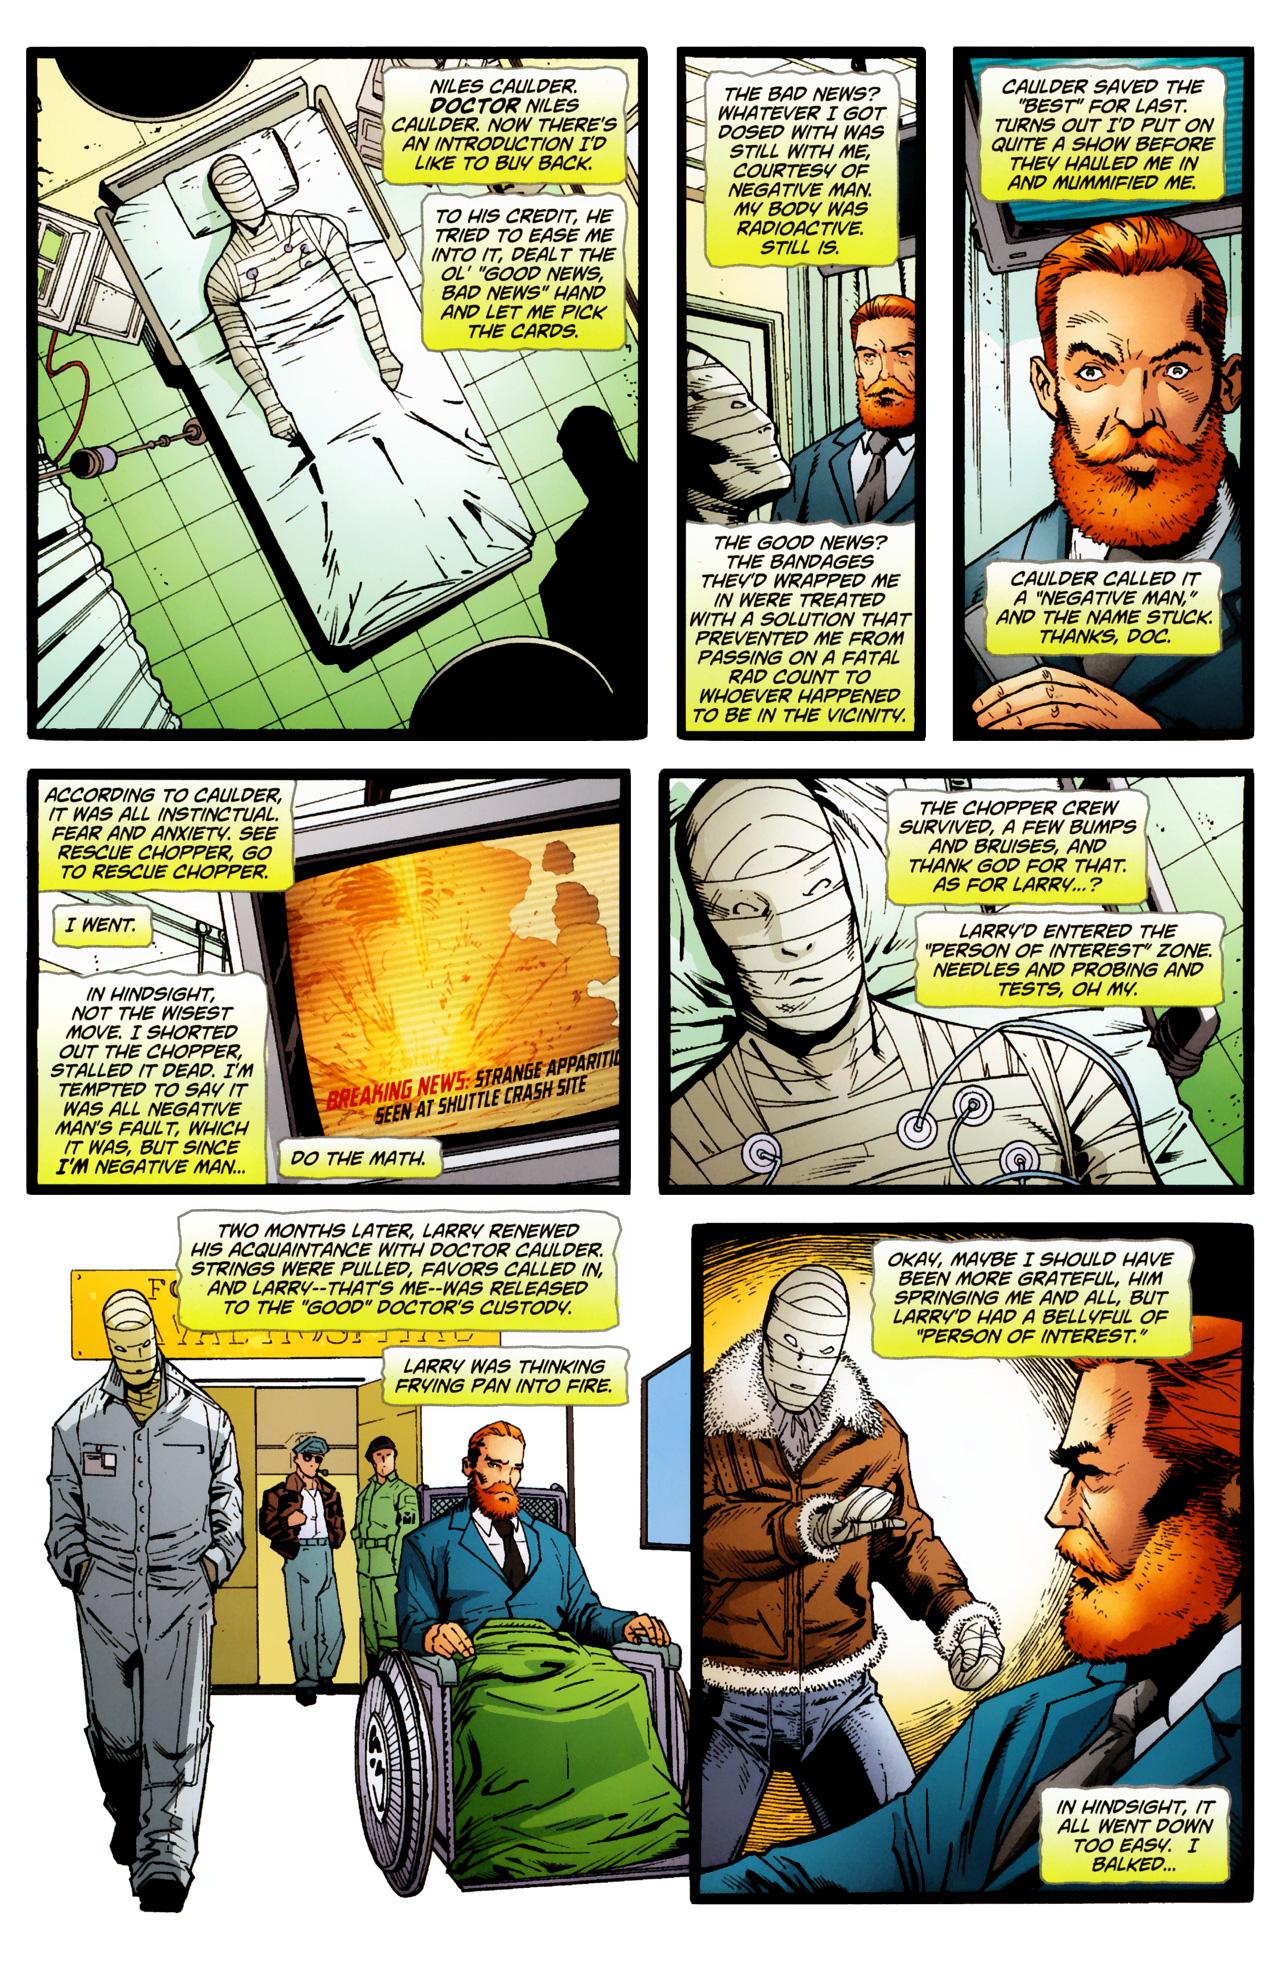 Doom Patrol (2009) #6 - Read Doom Patrol (2009) Issue #6 Page 5